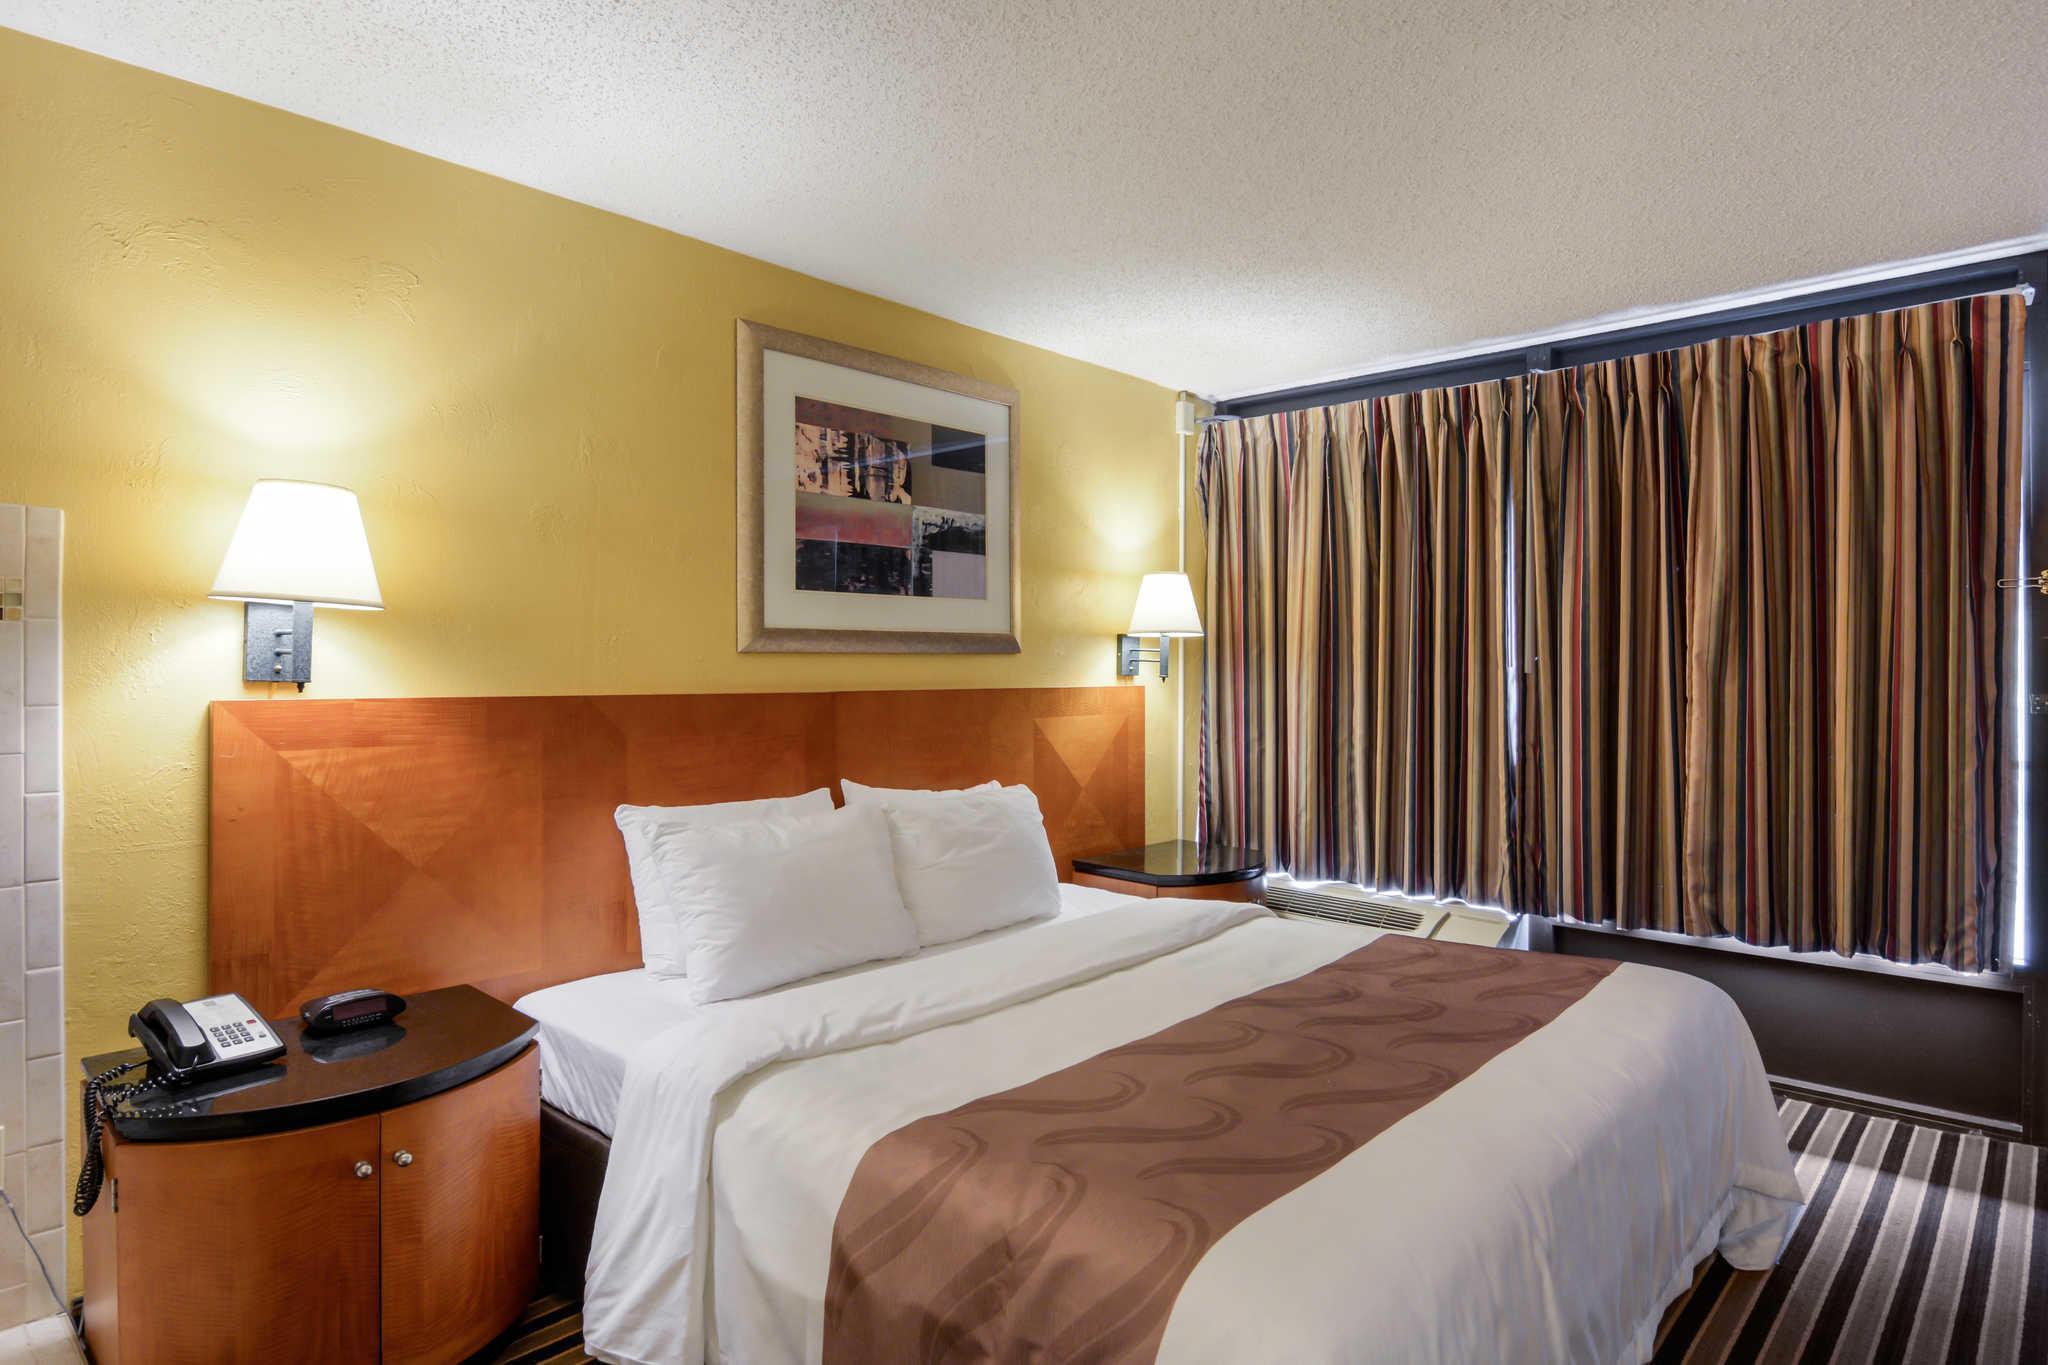 Quality Inn Skyline Drive image 22